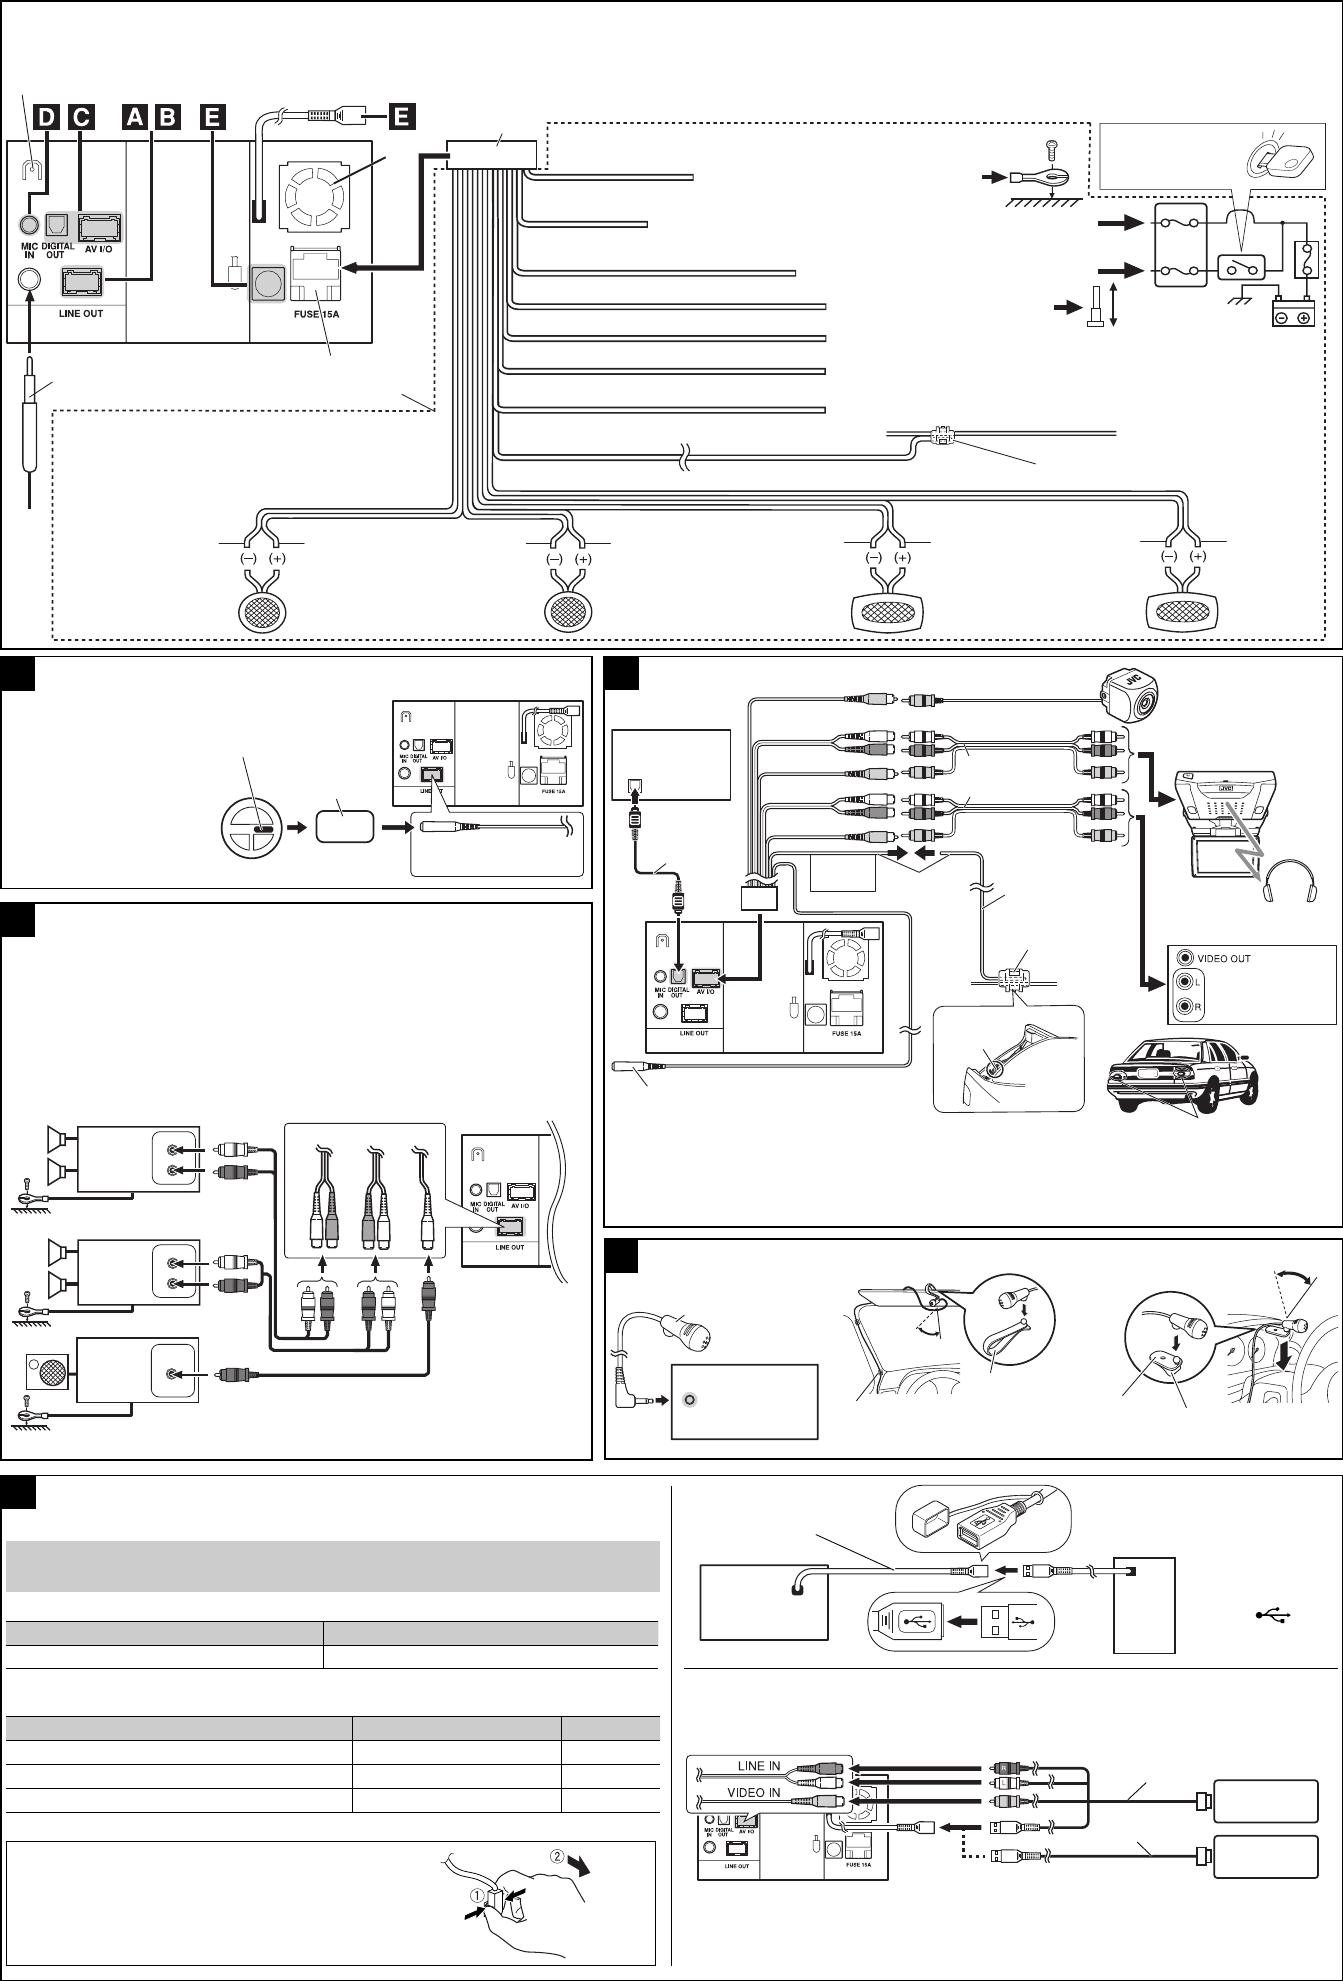 [DIAGRAM_1JK]  JVC KW AVX824UI AVX826/824[A/UI] Install User Manual LVT1997 008A | Jvc Kw Wiring Diagram |  | UserManual.wiki